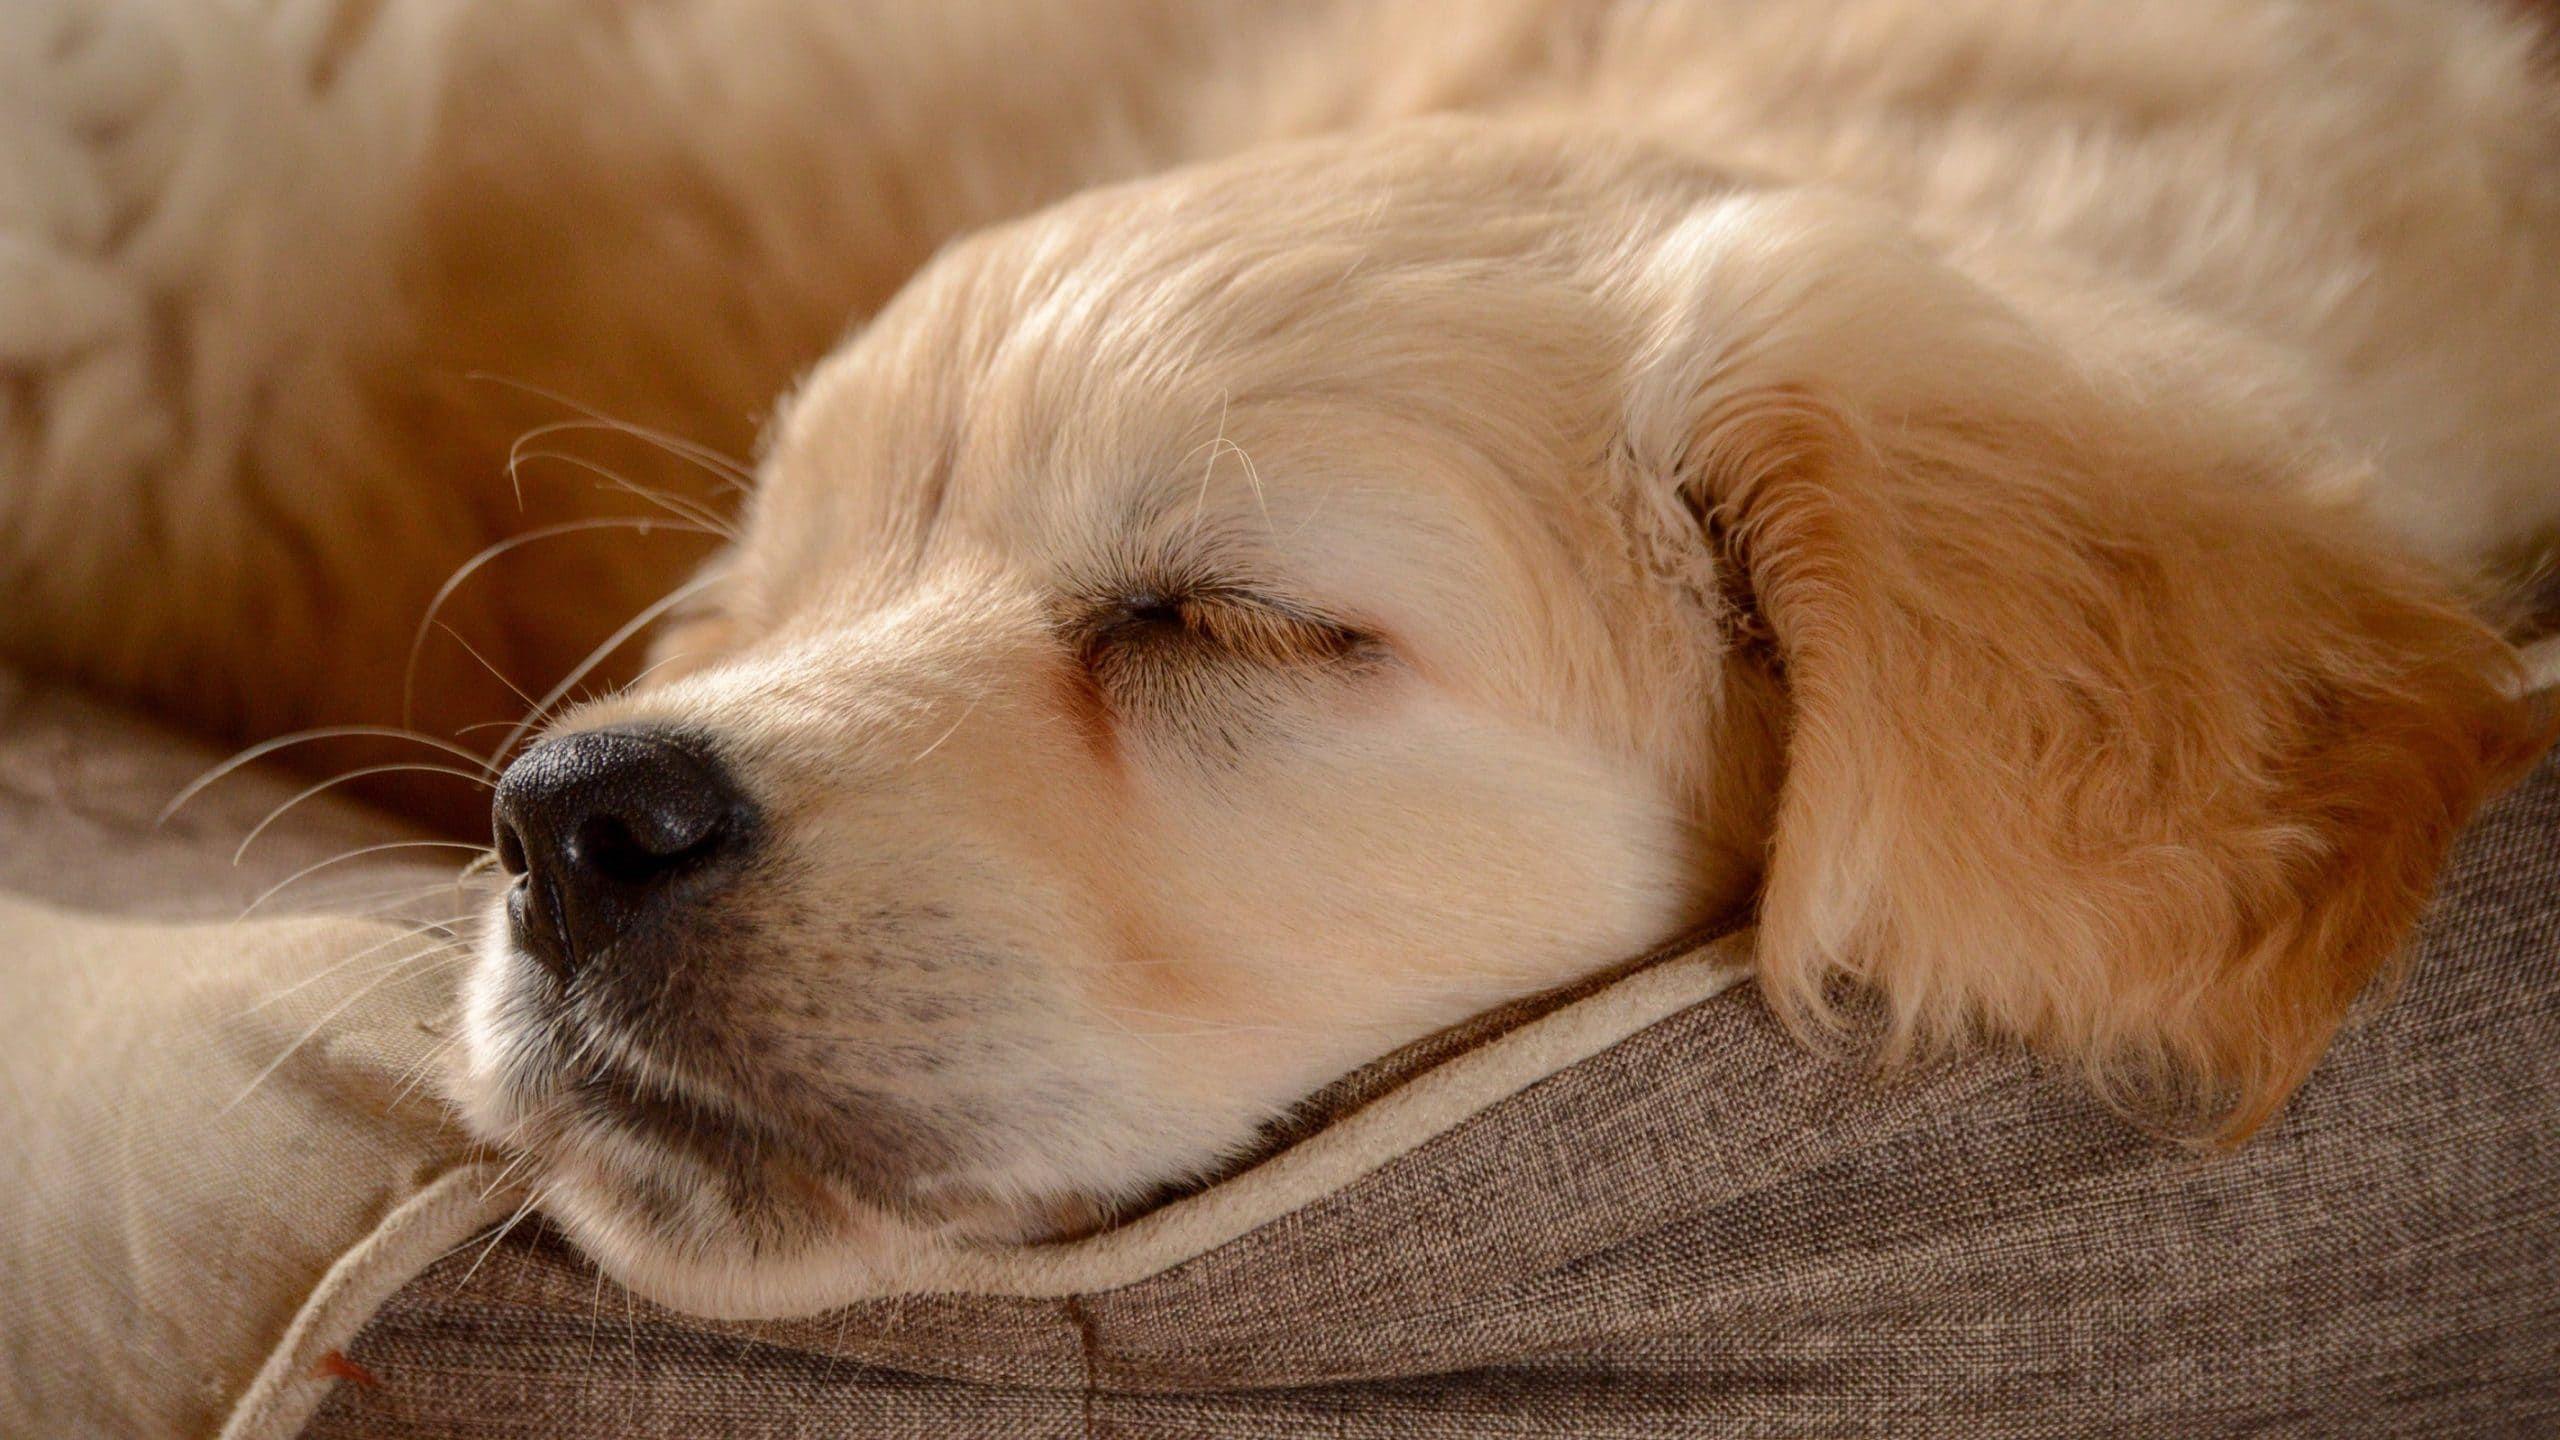 Chiens Repos Resting Dogs Voyage Onirique En 2020 Golden Retriever Chiots Endormis Chien Retriever